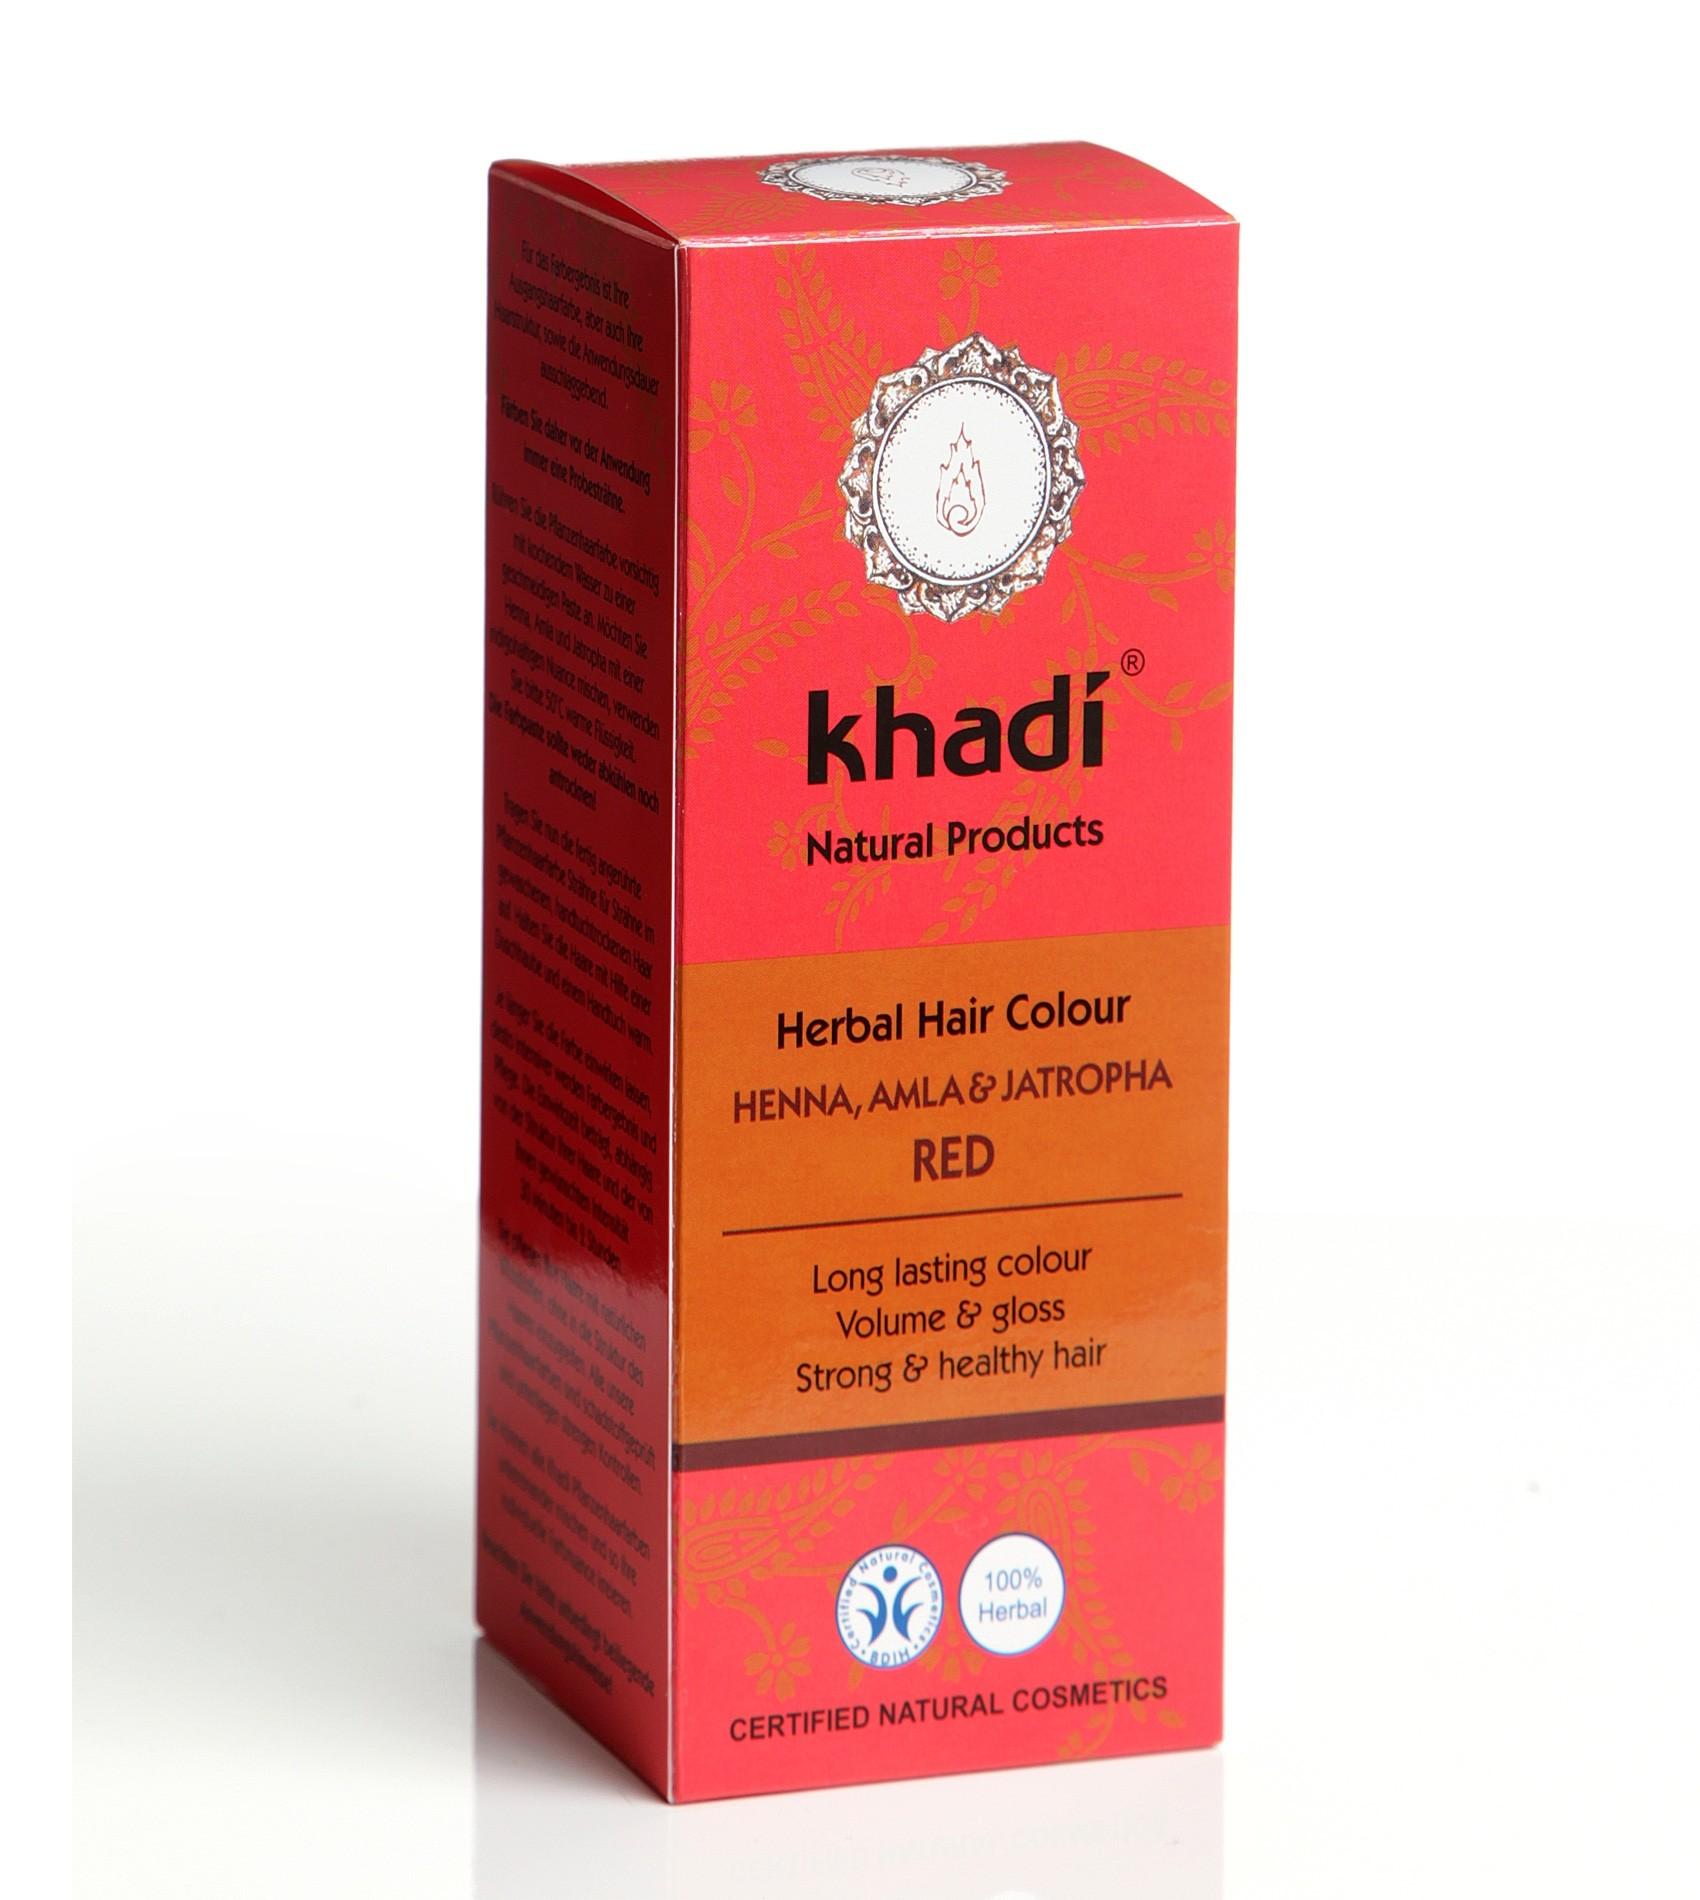 Khadi Herbal Hair Colour Henna Amla & Jatropha